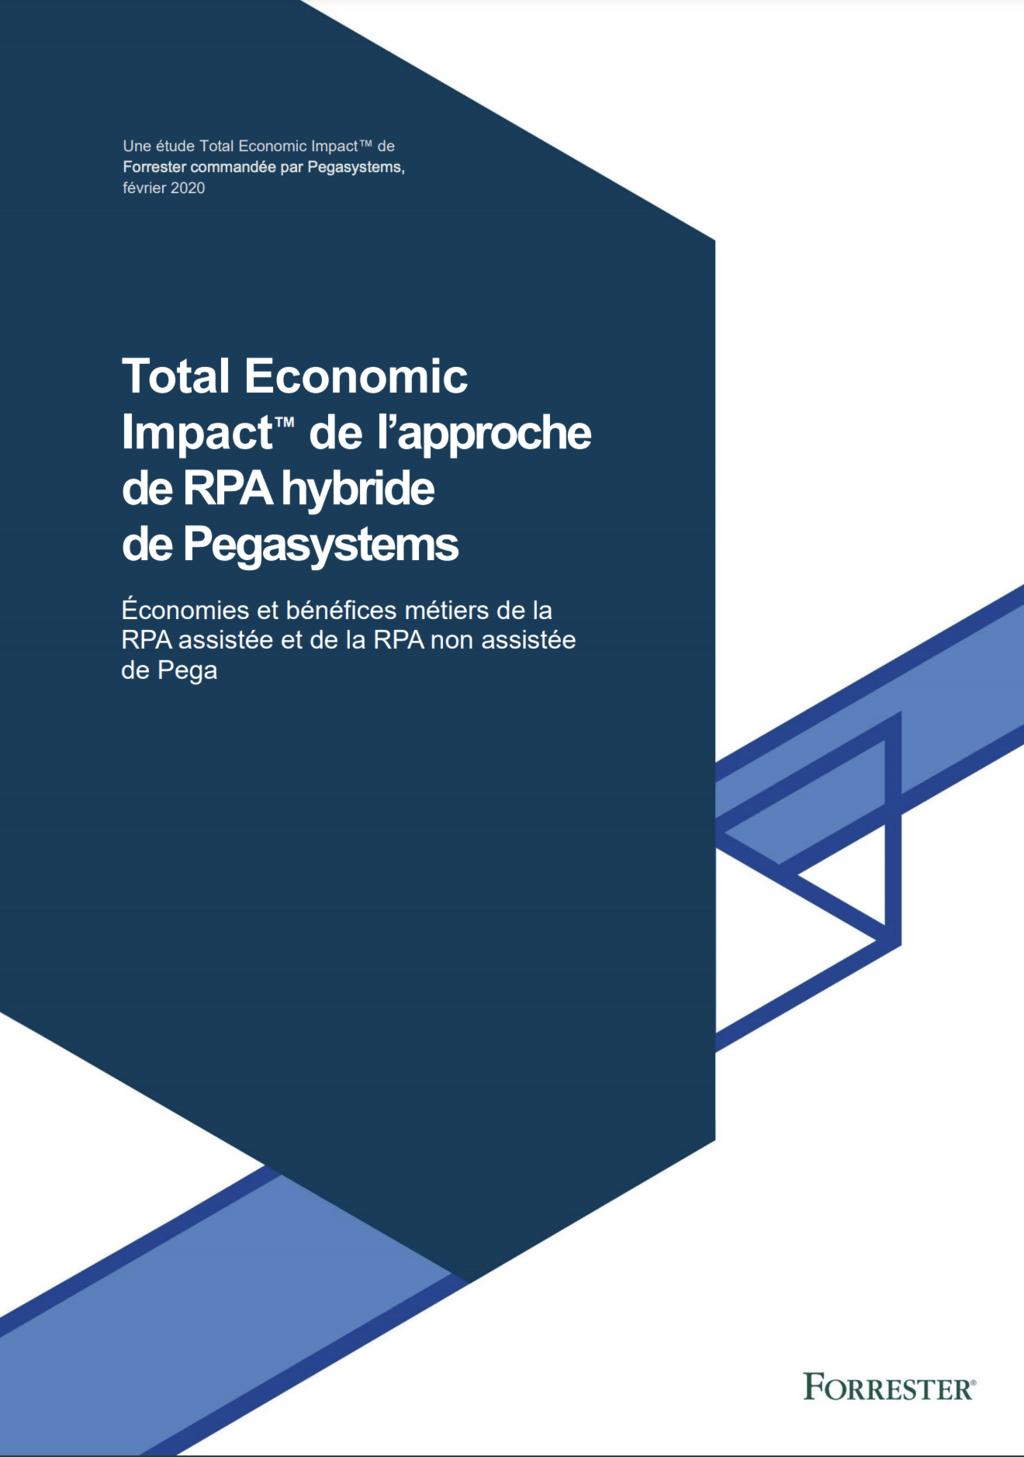 FR-asset-title-page